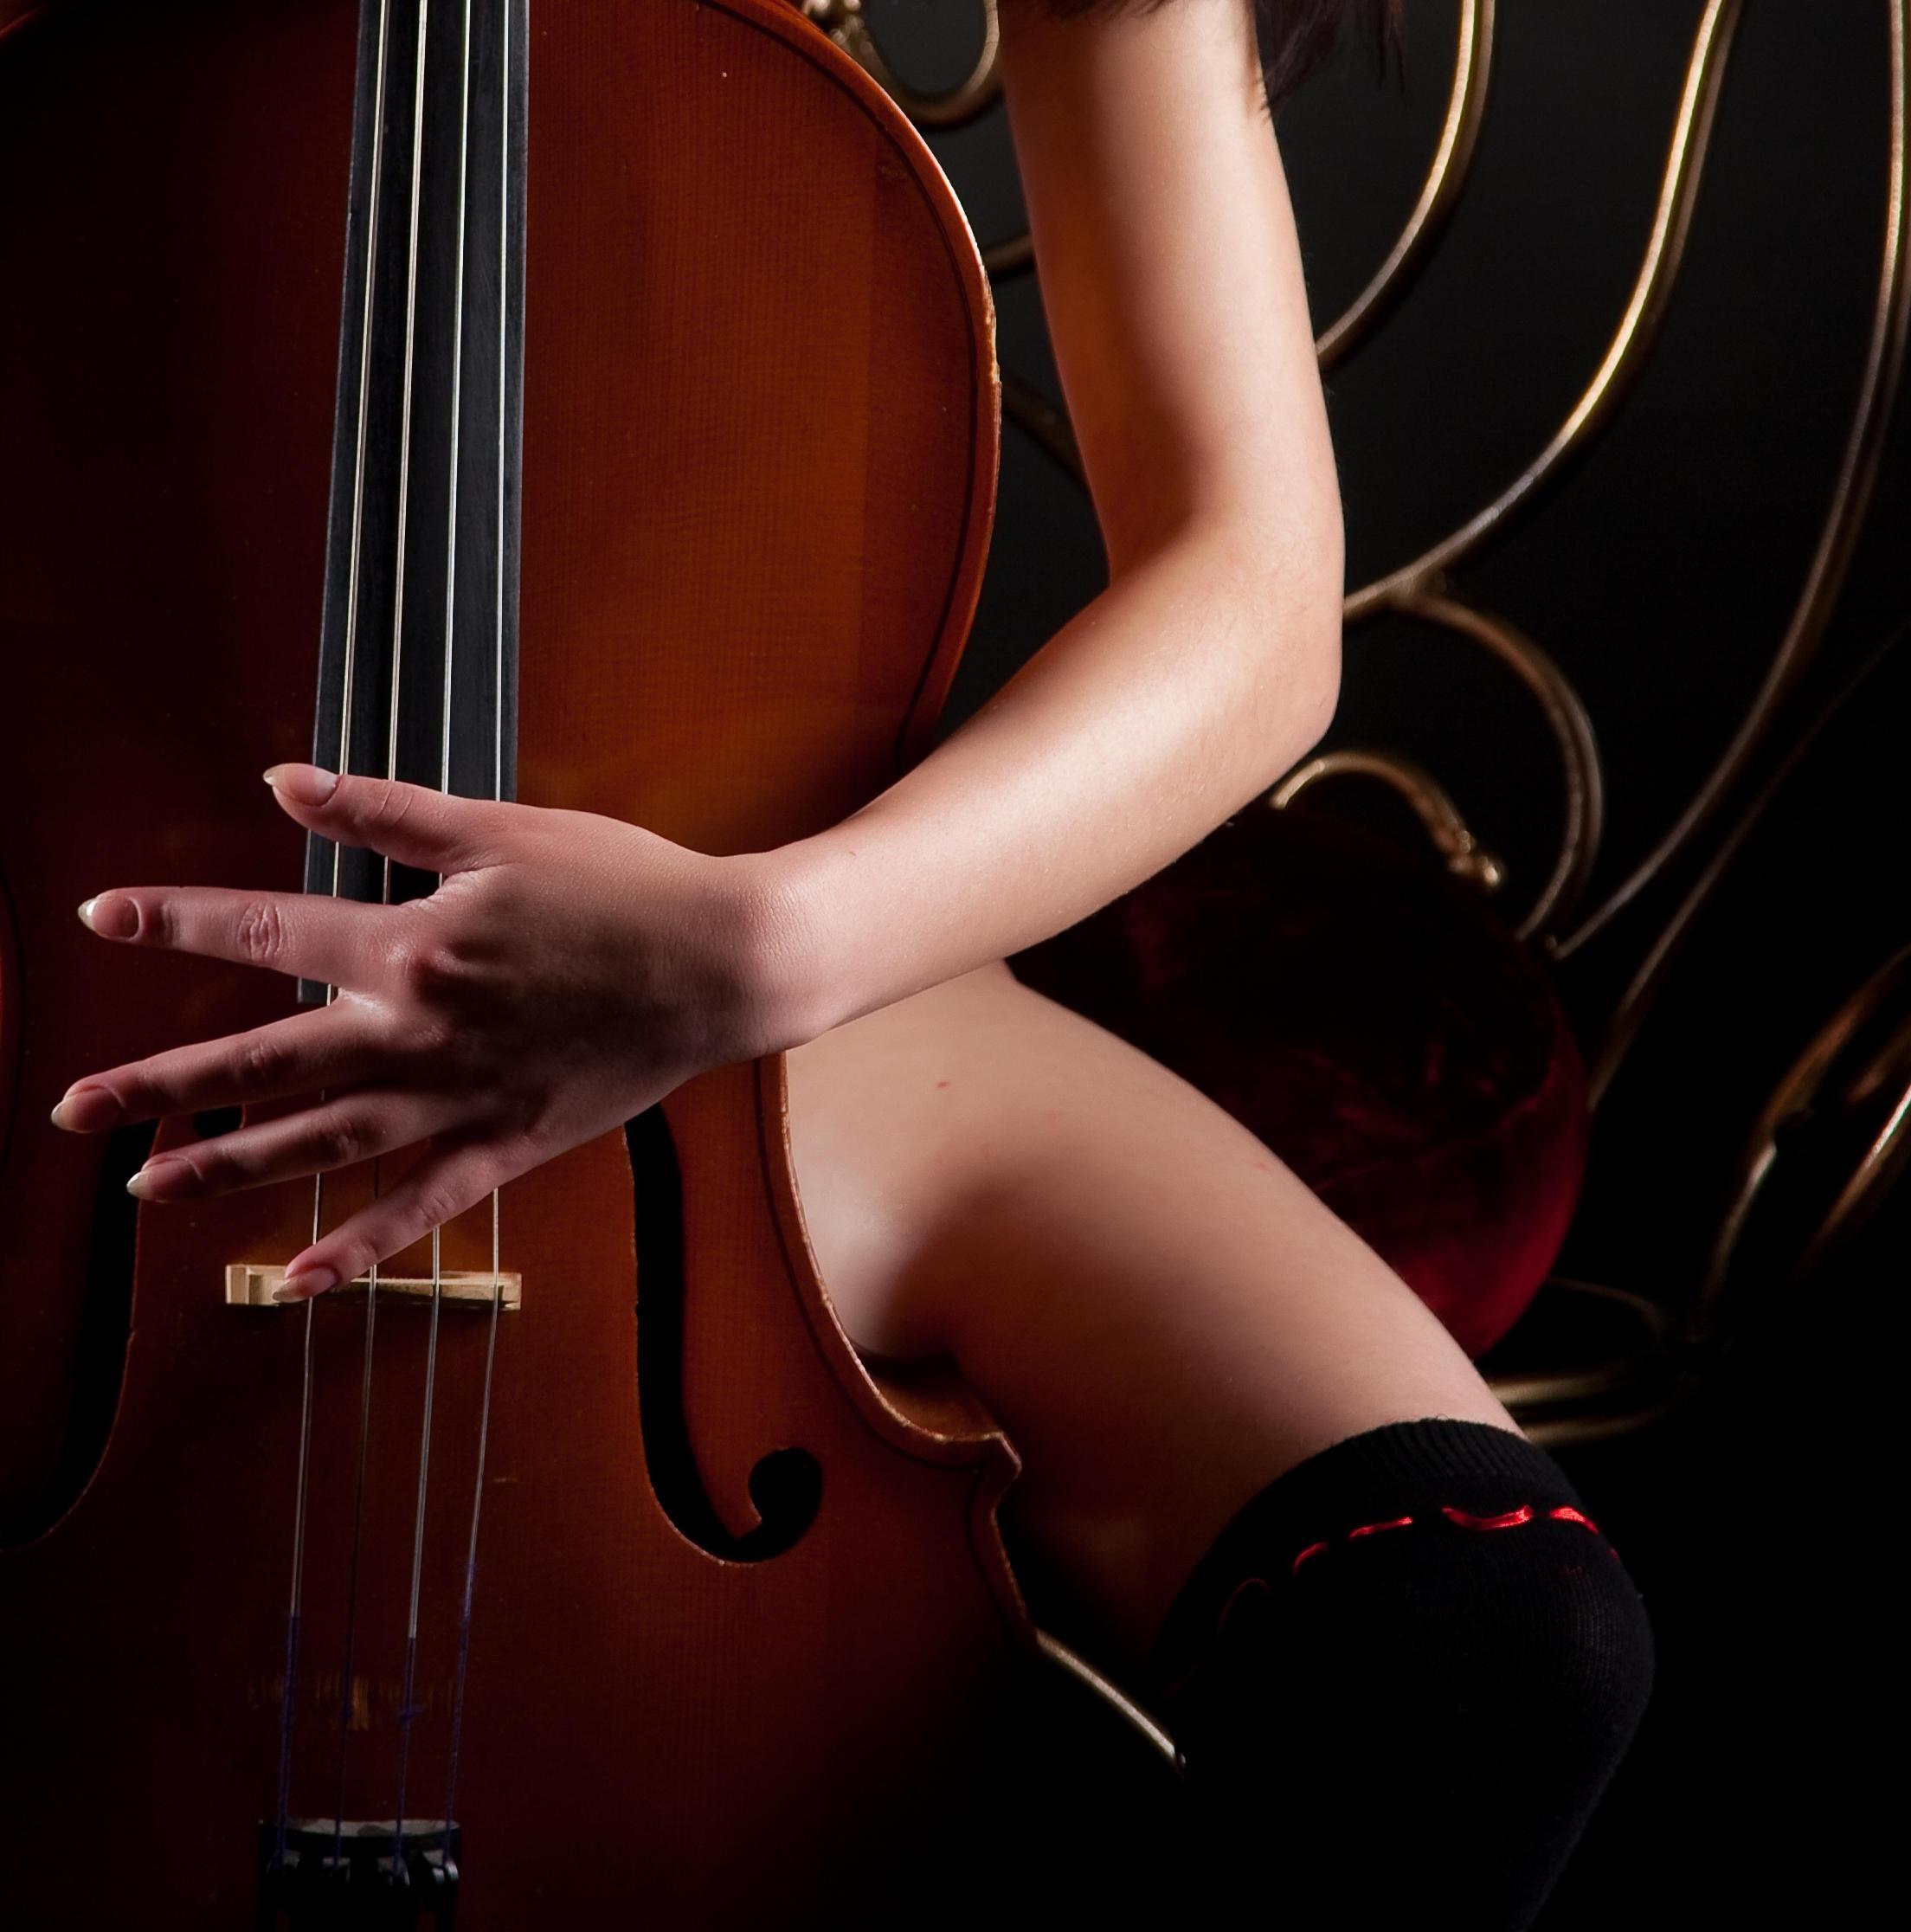 Milla plays the cello nude